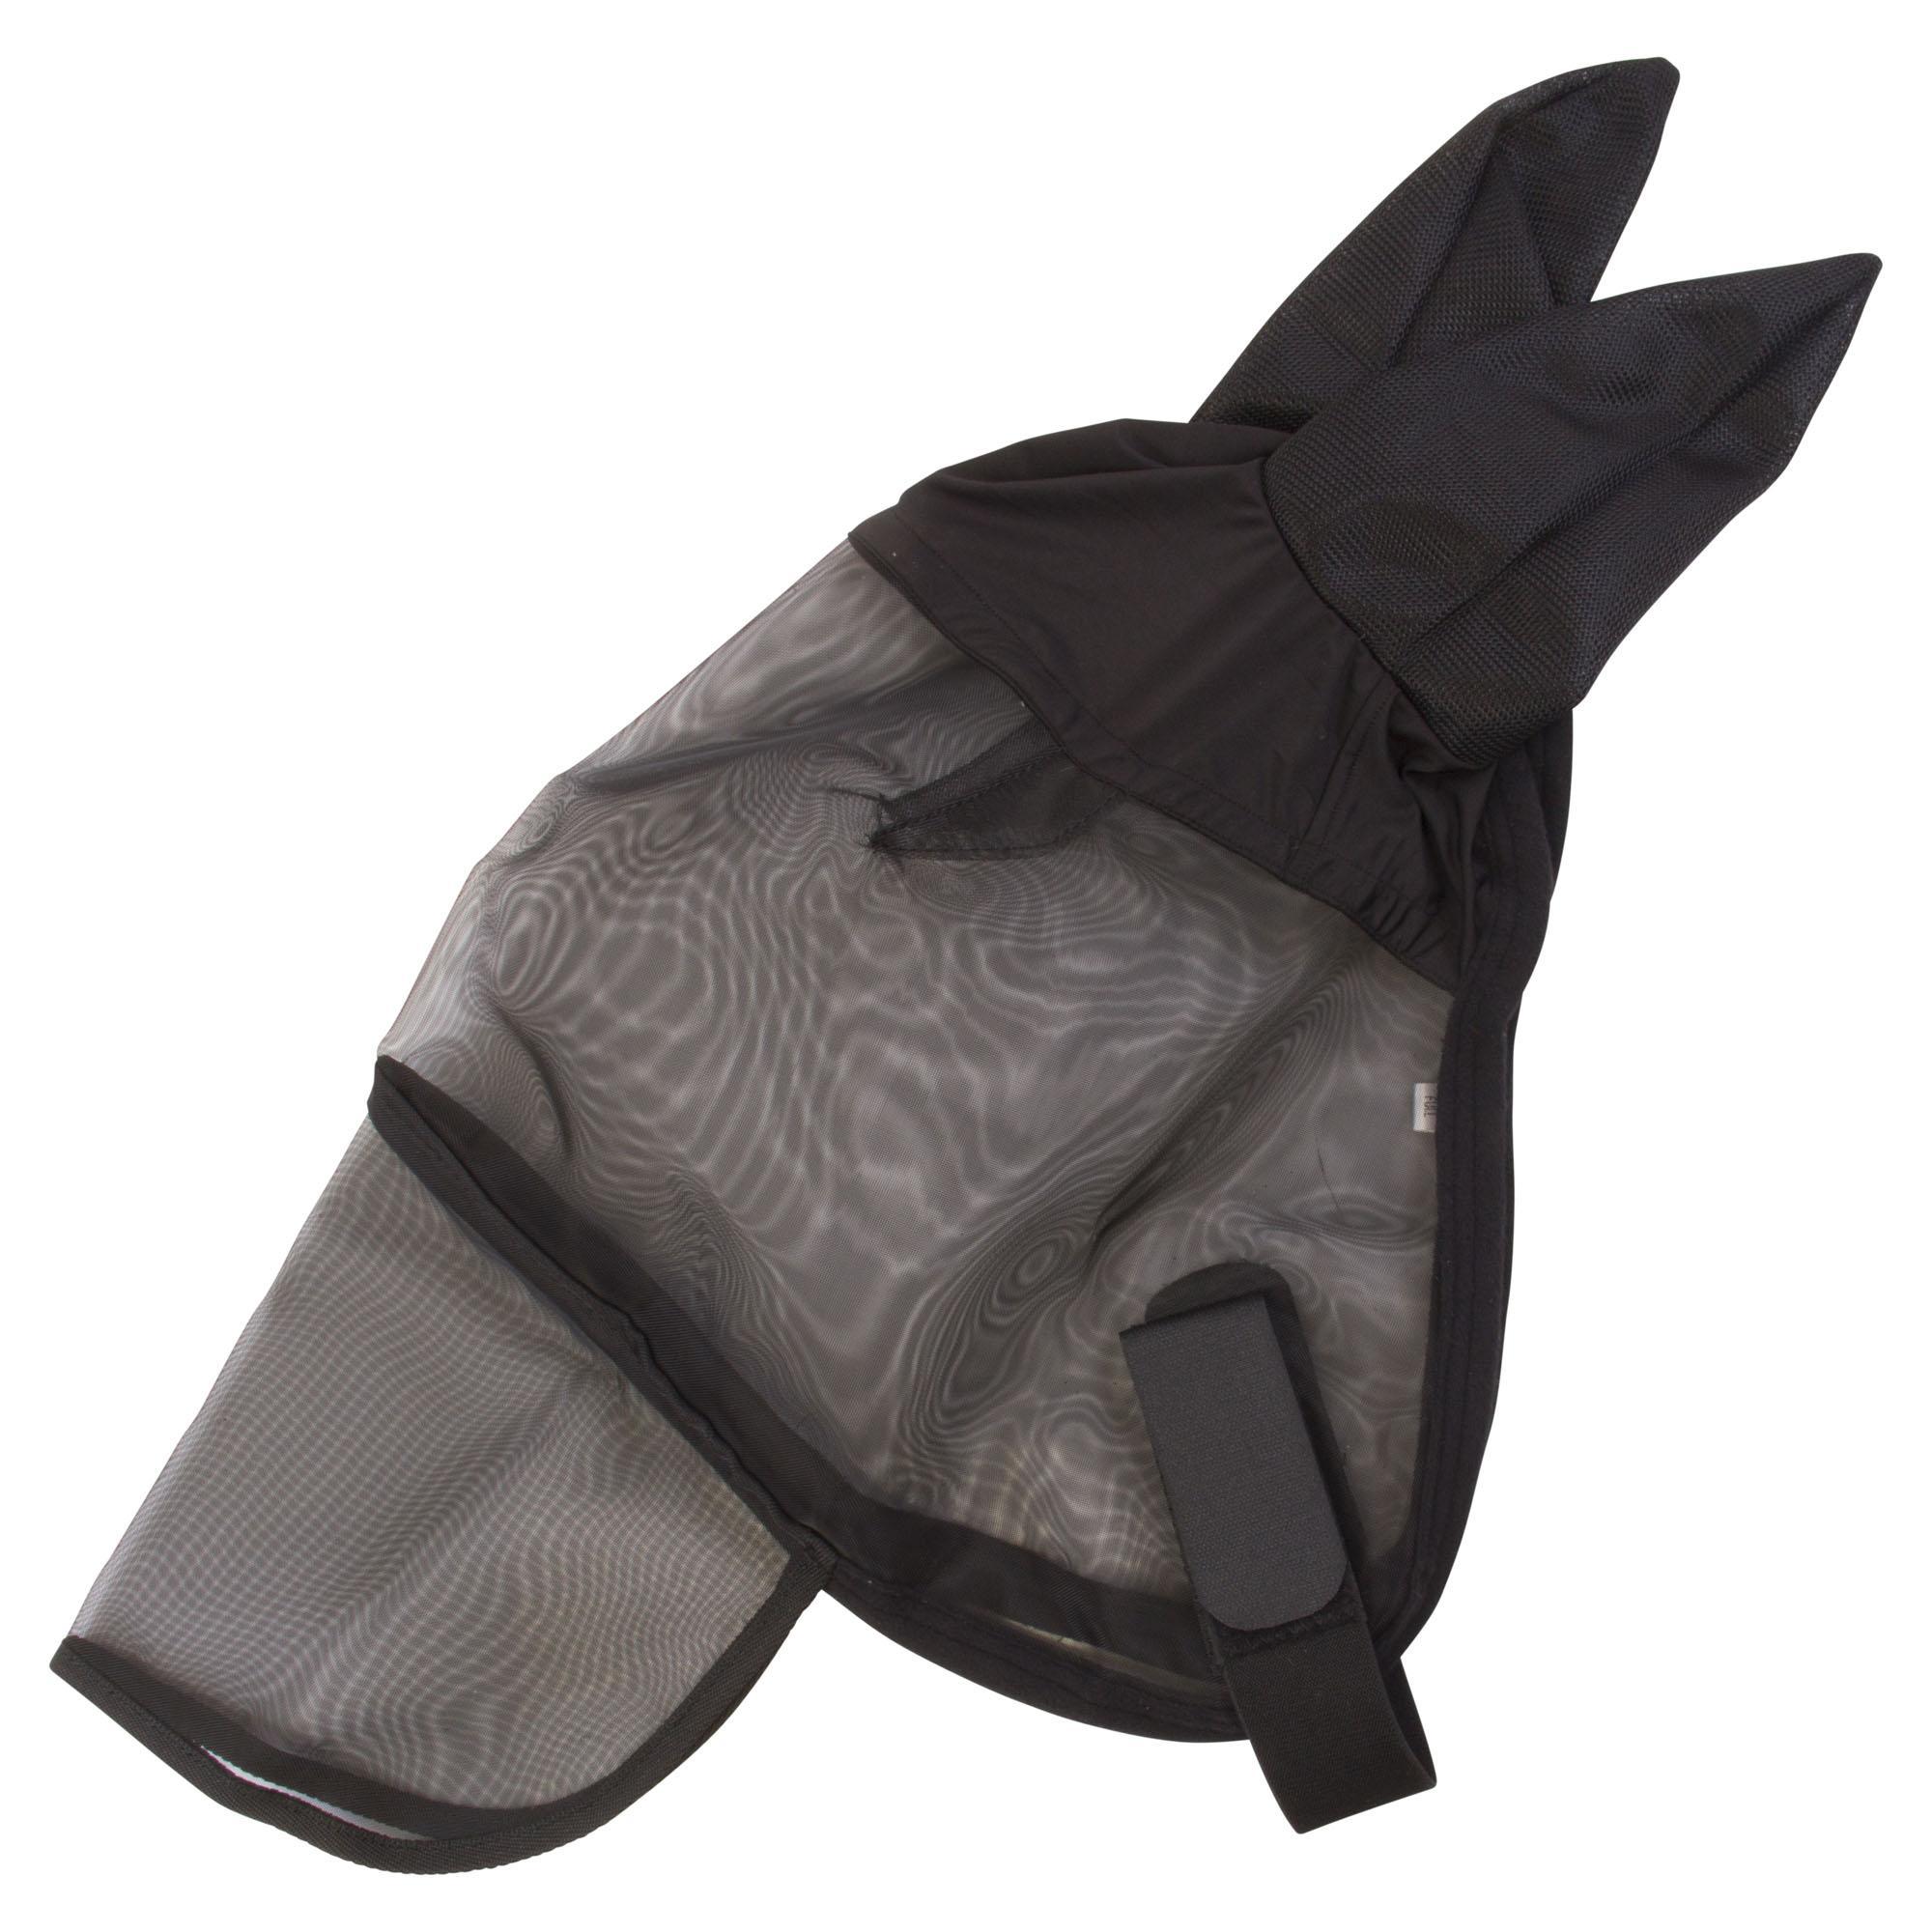 Imperial Riding Vliegenmasker met oren en neusflap